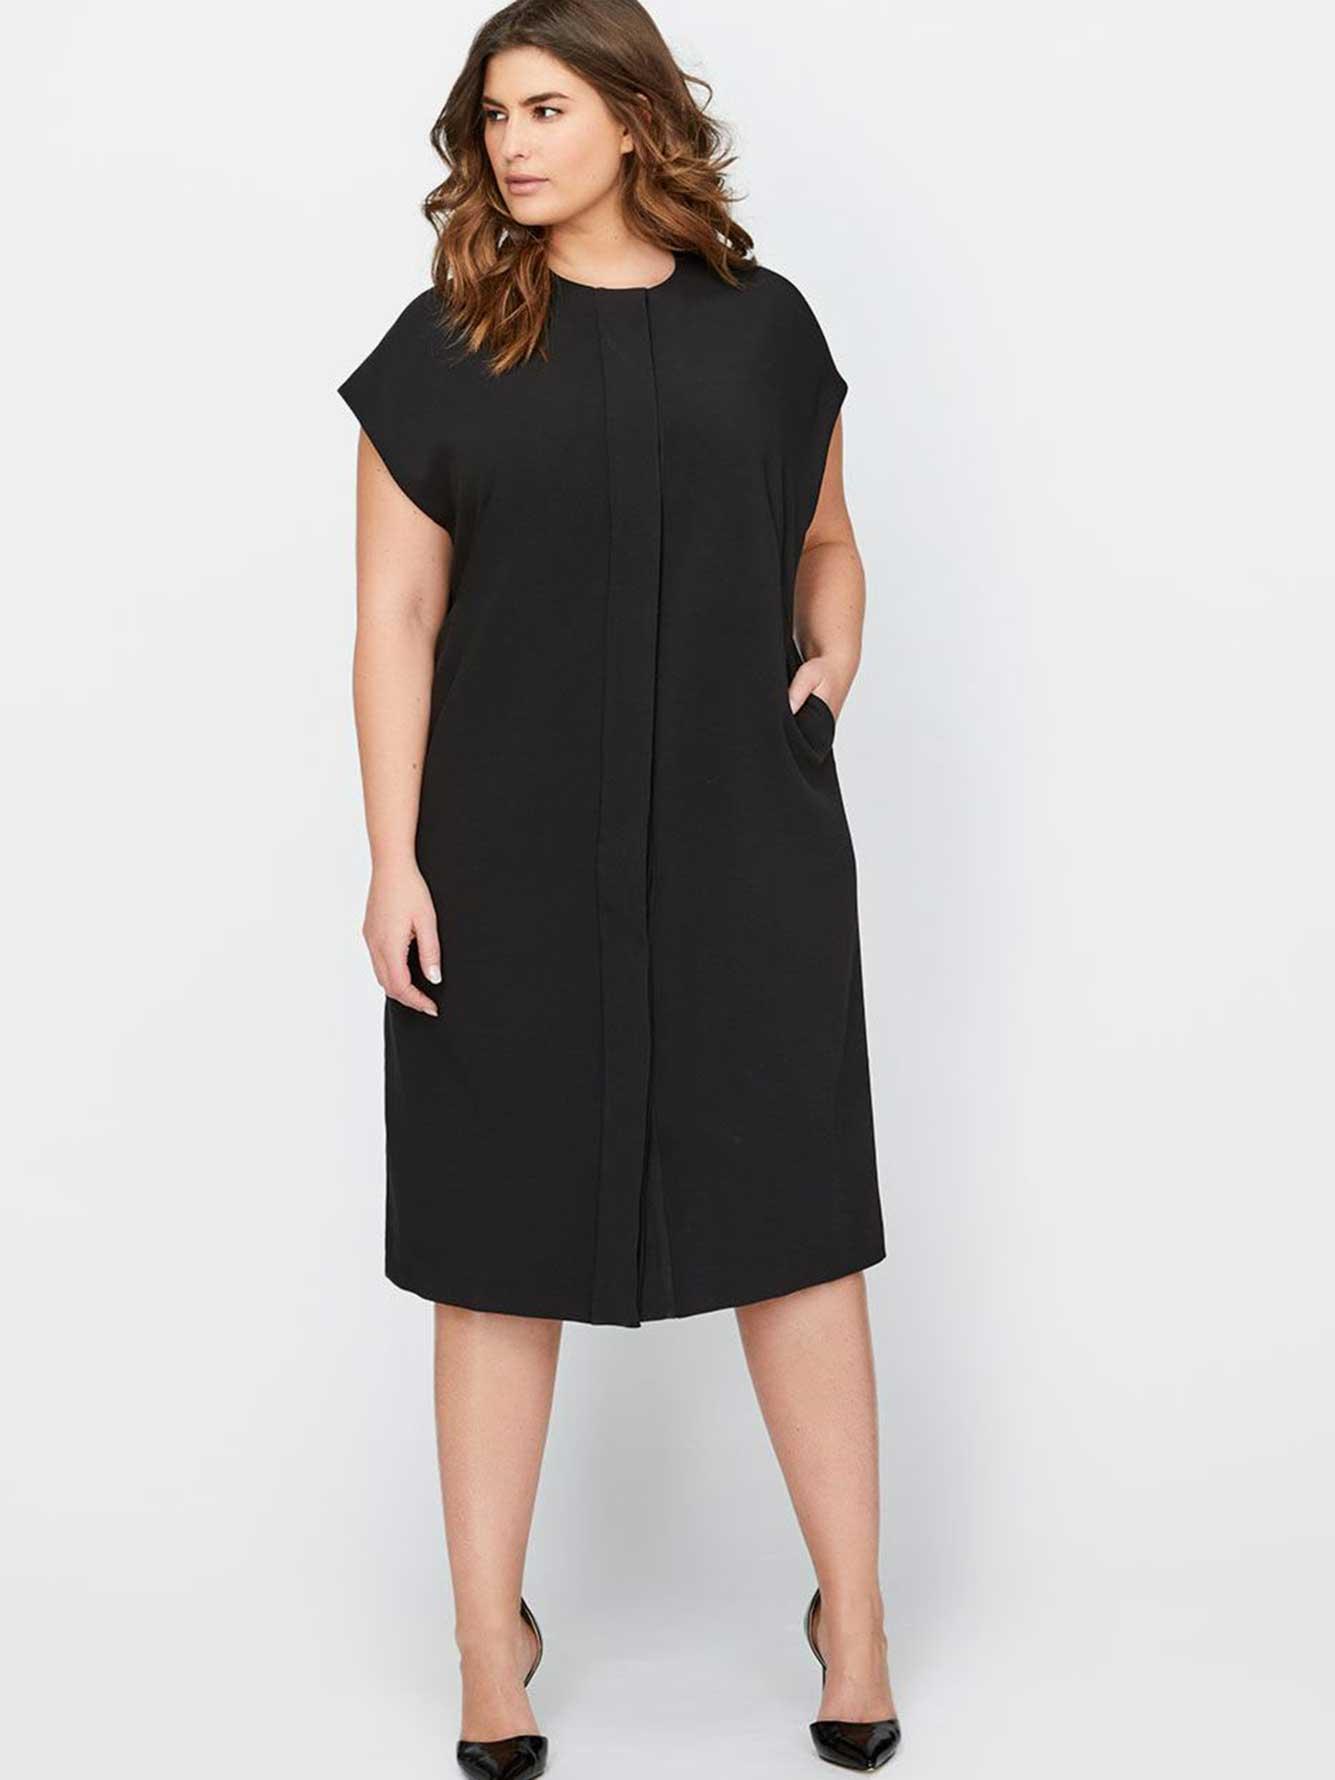 5070ce5db6342 Rachel Roy Modern Kimono Dress